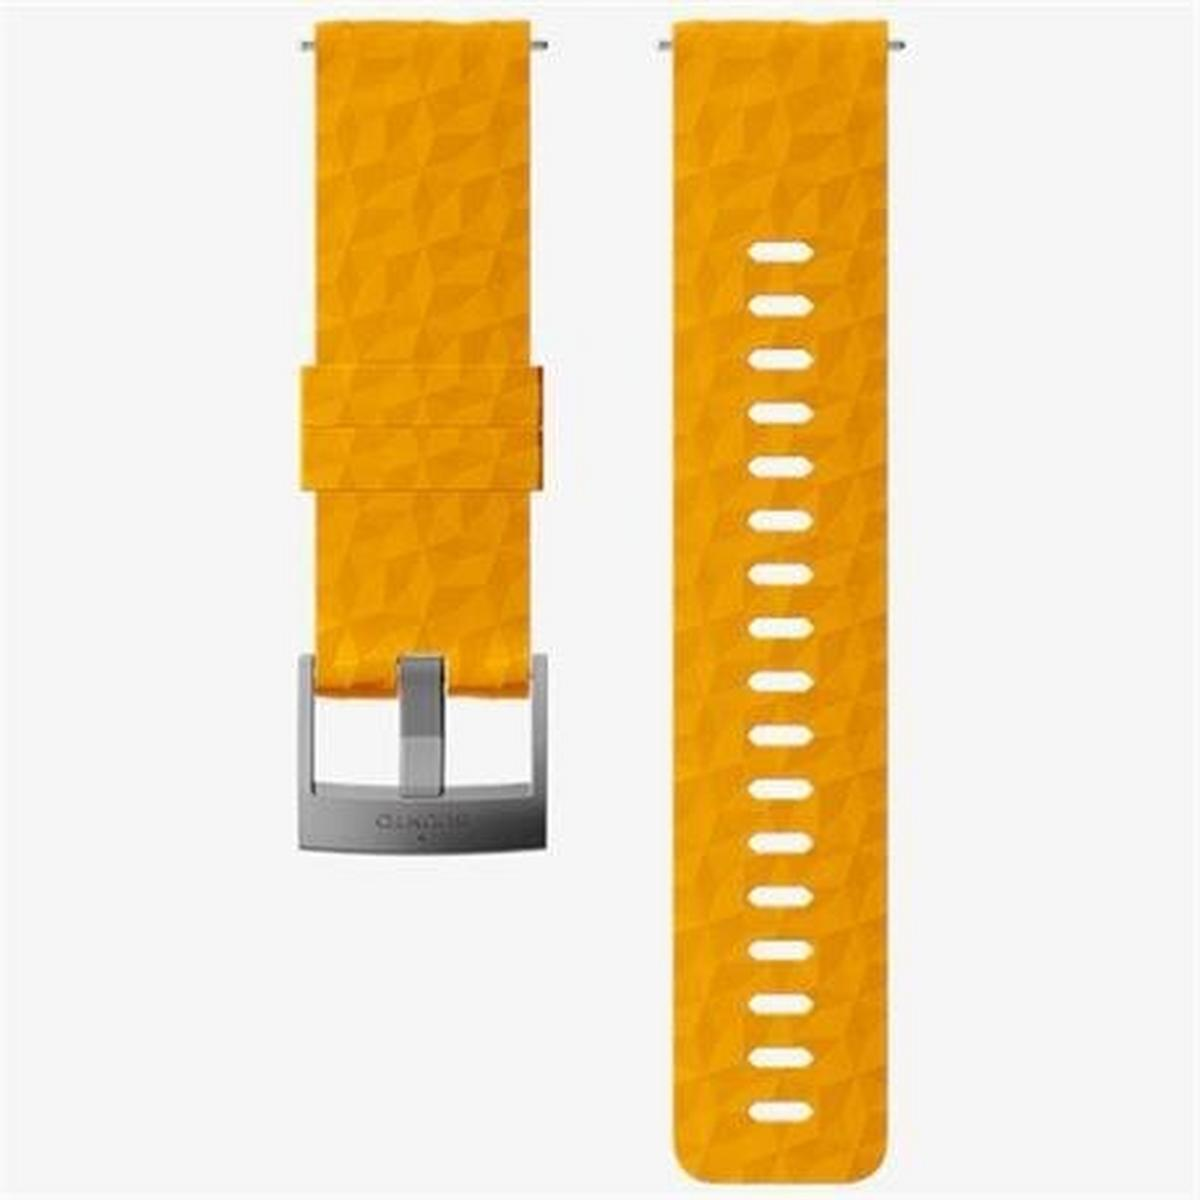 Suunto Watch Spare/Accessory: 24mm Explore 1 Silicone Strap Amber/Grey Medium